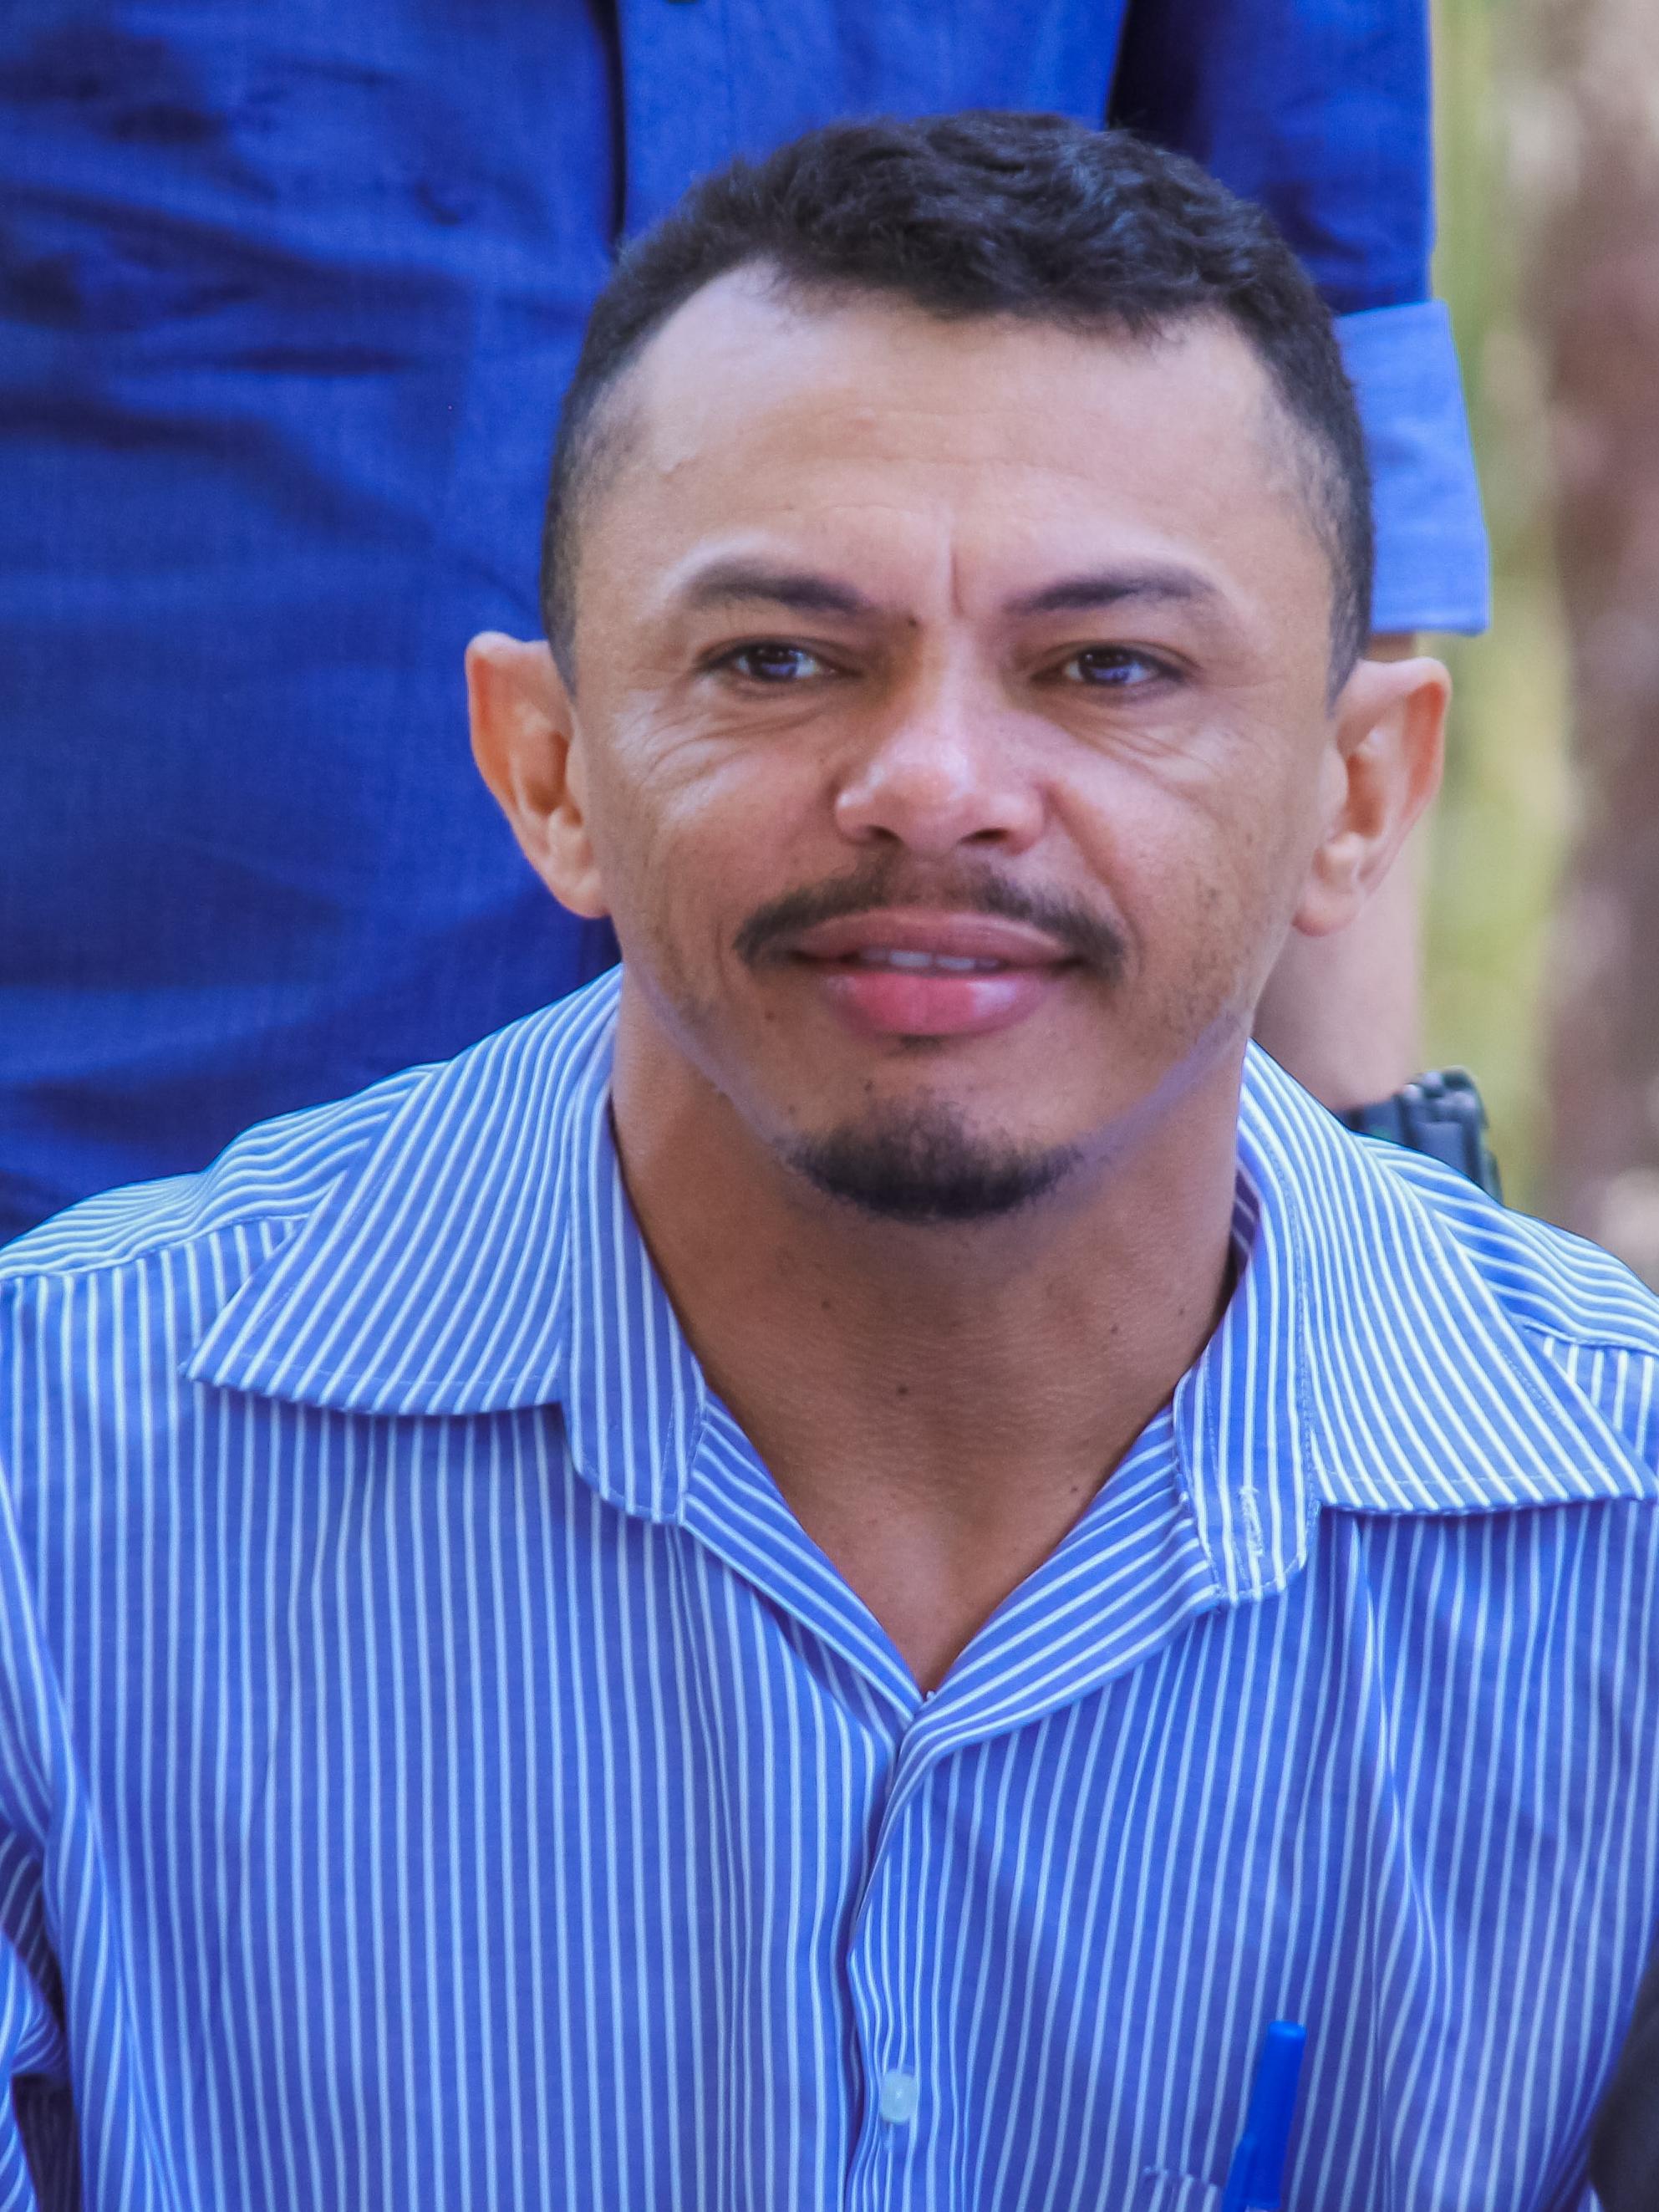 Francisco Elias Pereira- Biênio 2017/2018 - Vice-Presidente